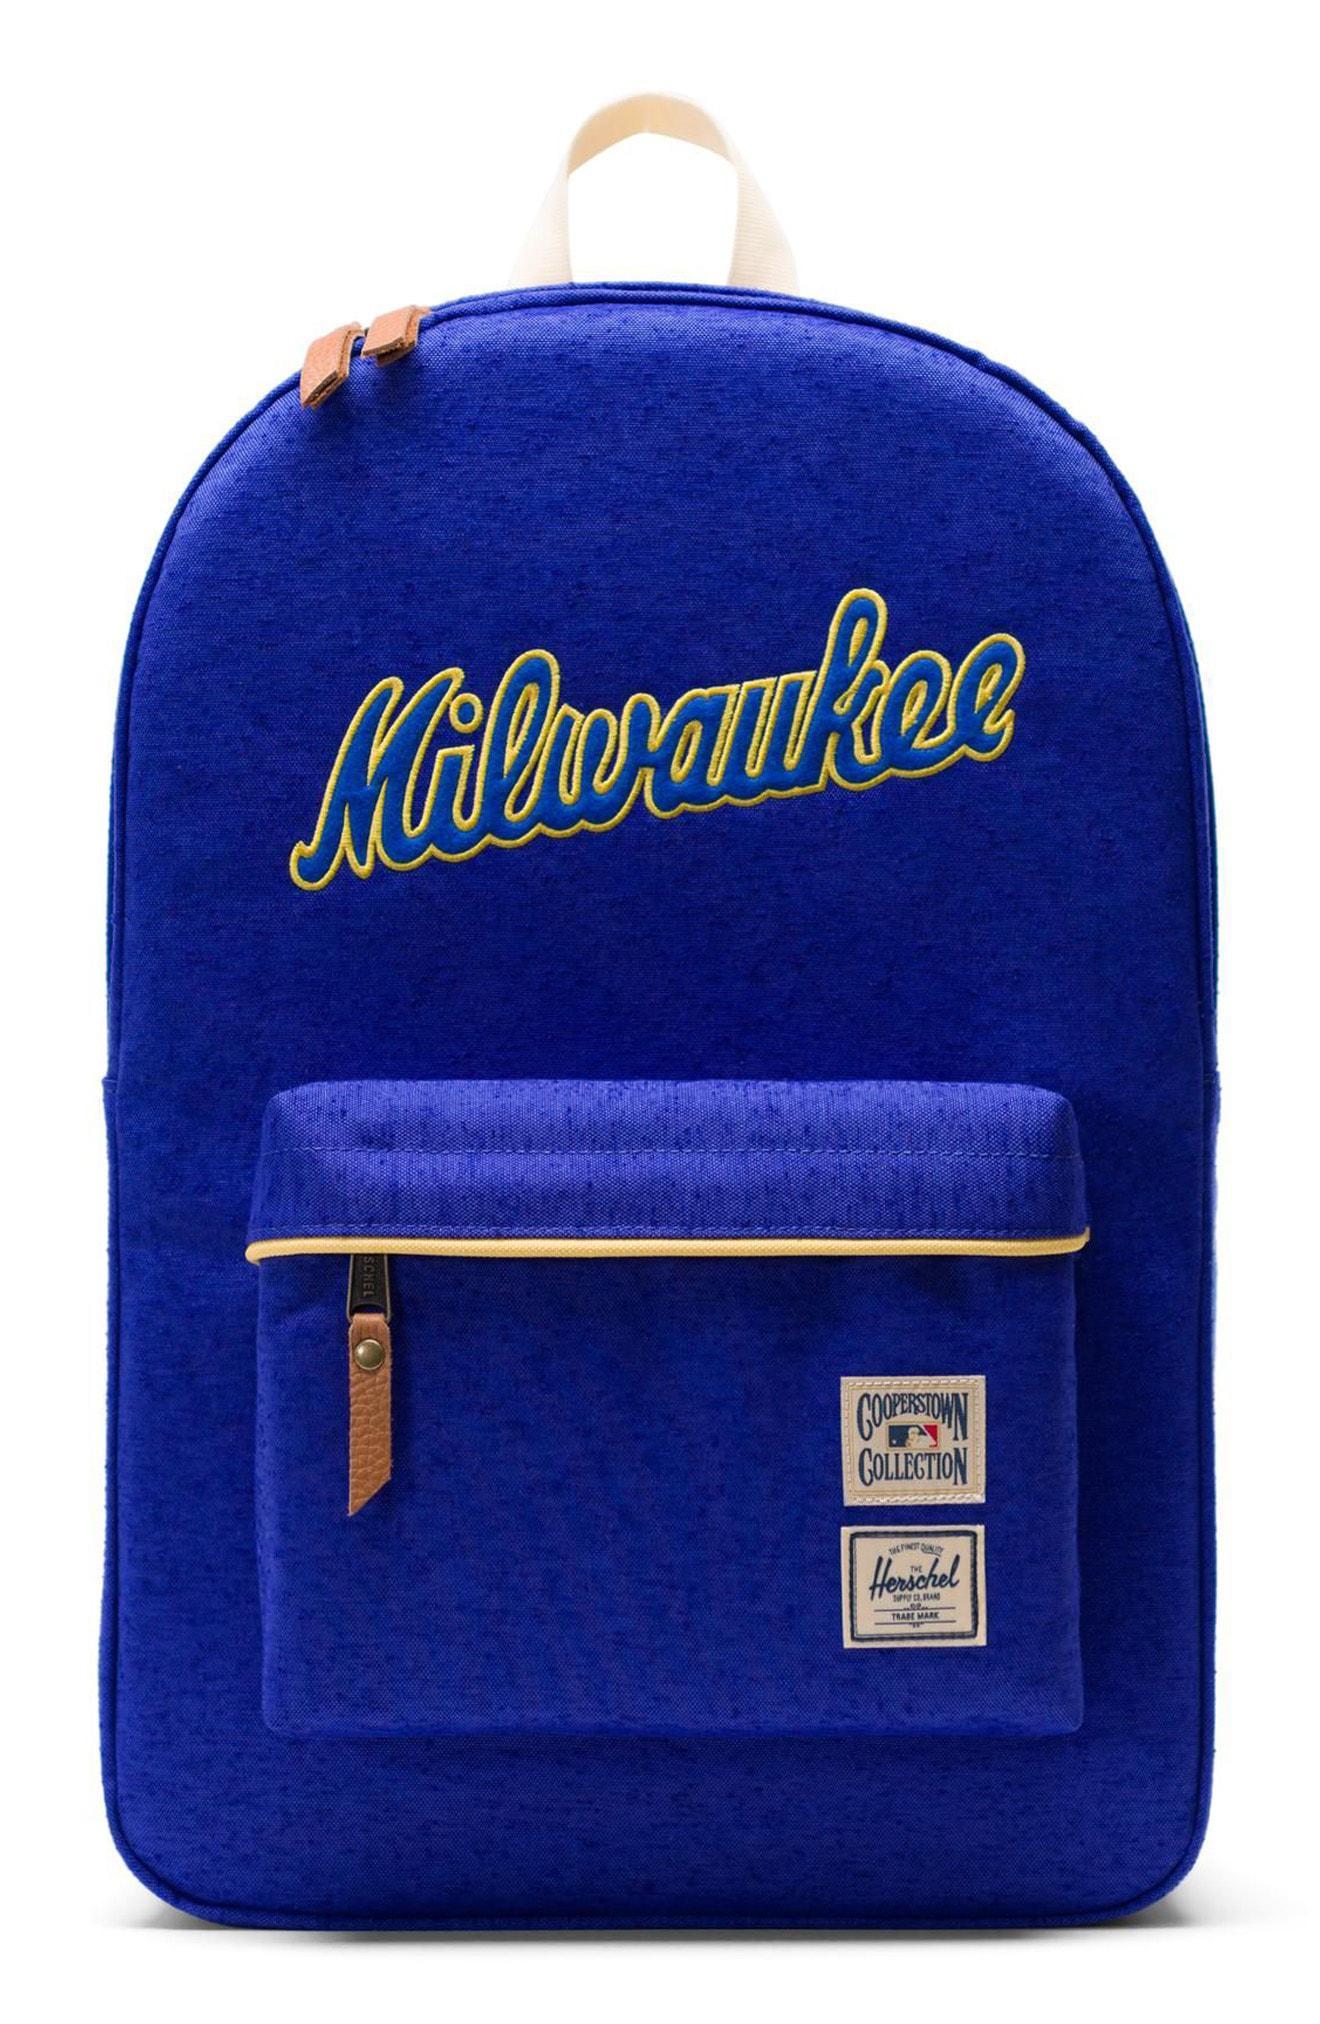 56510582ea Herschel Supply Co. Men s Blue Heritage - Mlb Cooperstown Collection  Backpack